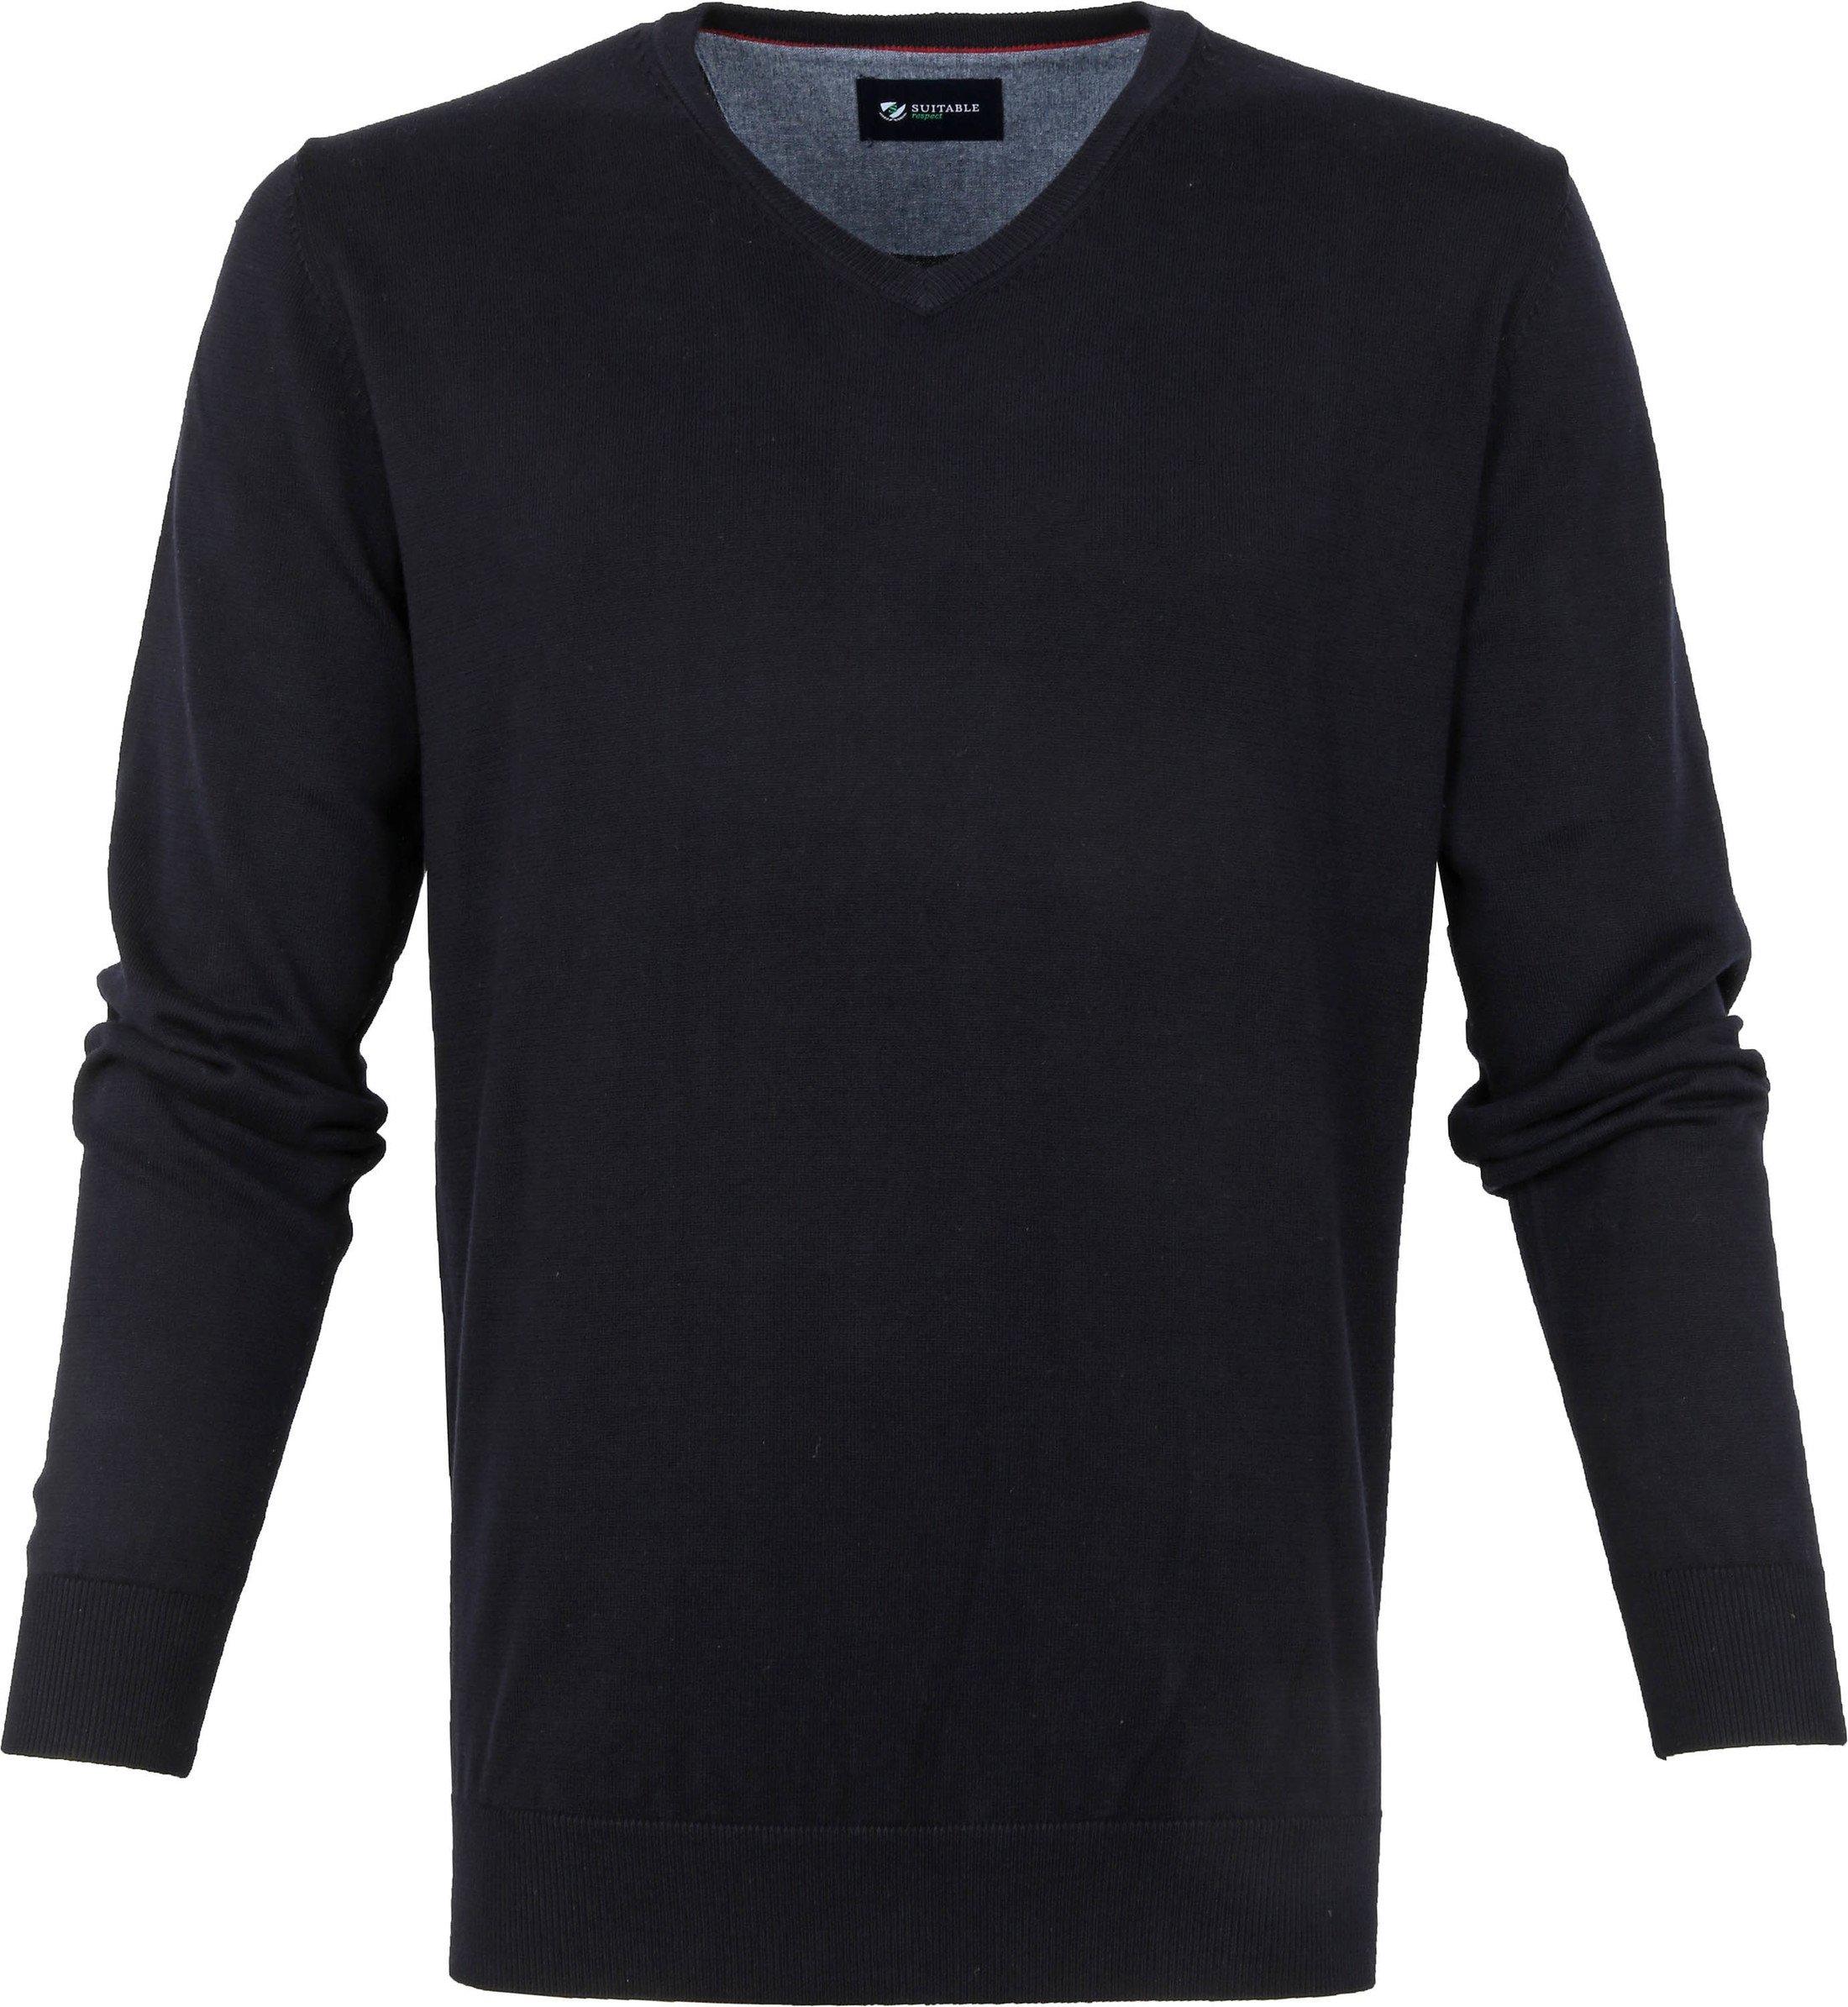 Suitable Cotton Vini Pullover V-Neck Dark Blue